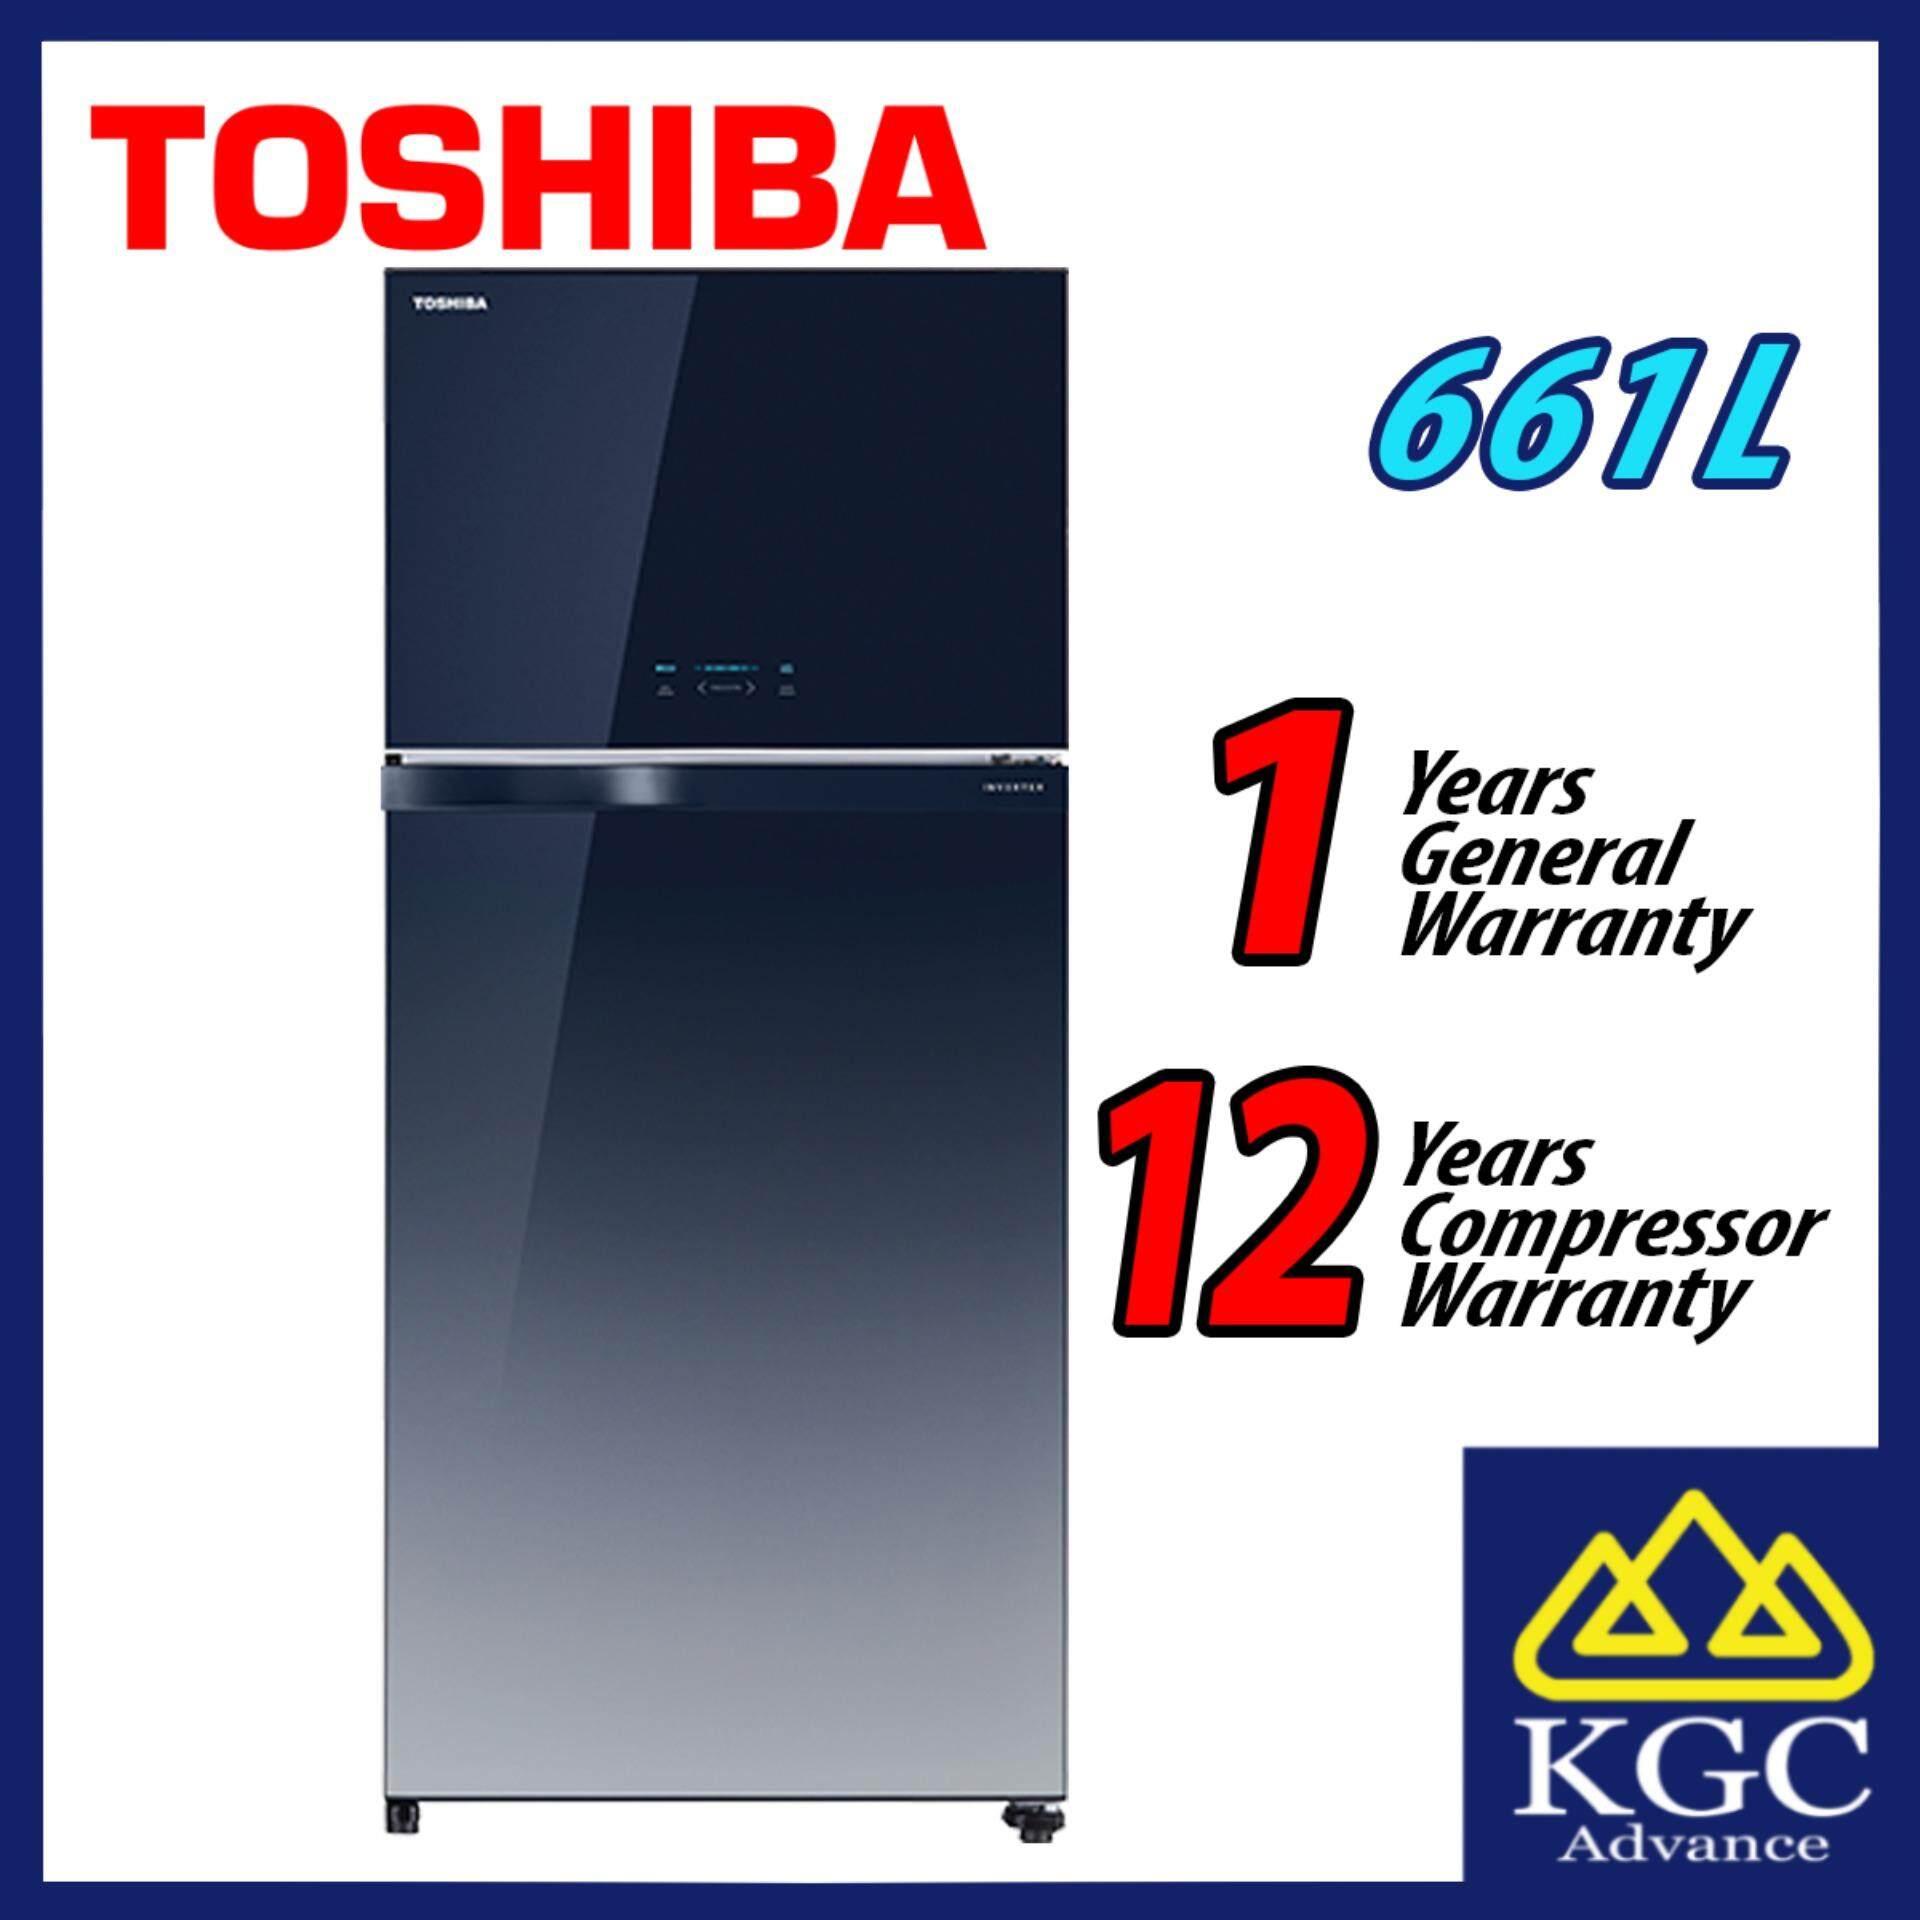 Toshiba Fridge 661L 2-Doors Inverter Refrigerator GR-AG66MA (GG)